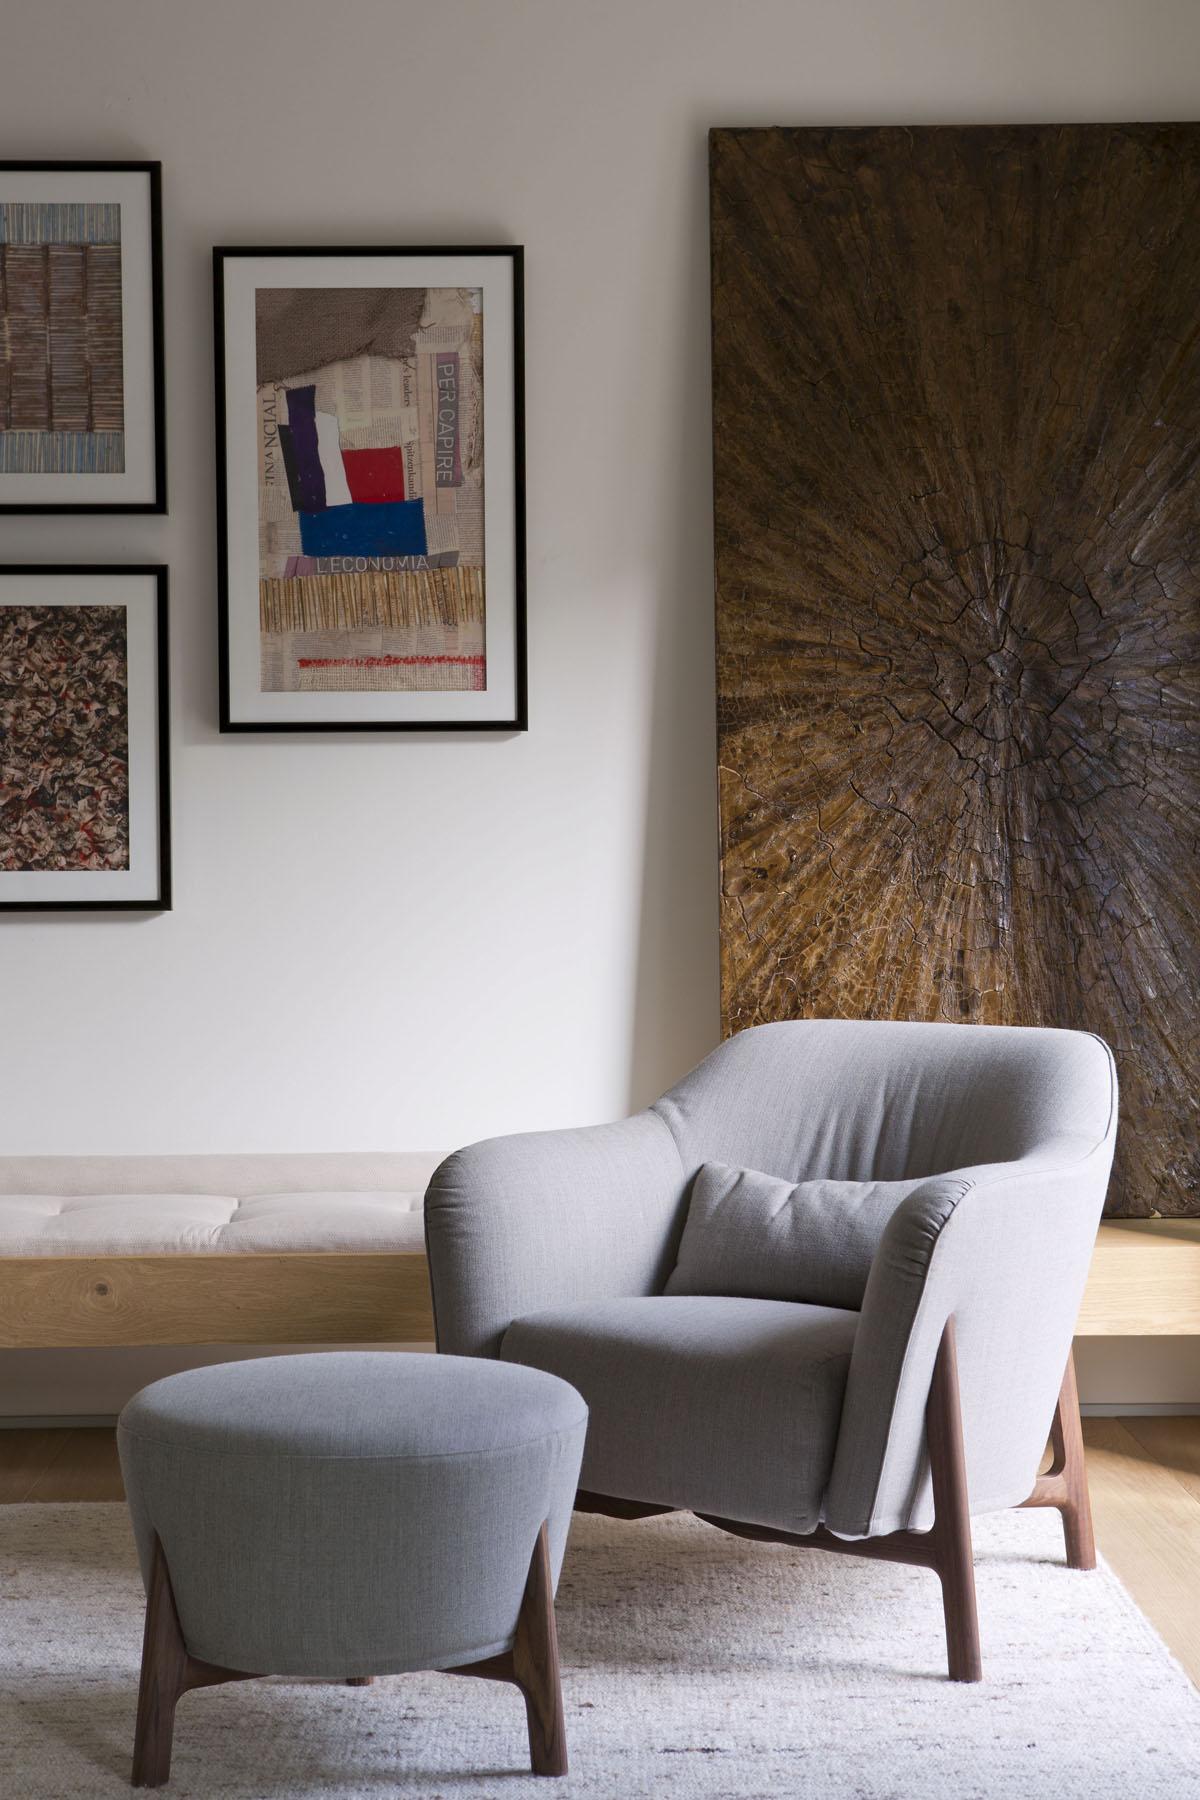 01 bonucci Sleek Modern by Fabio Fantolino